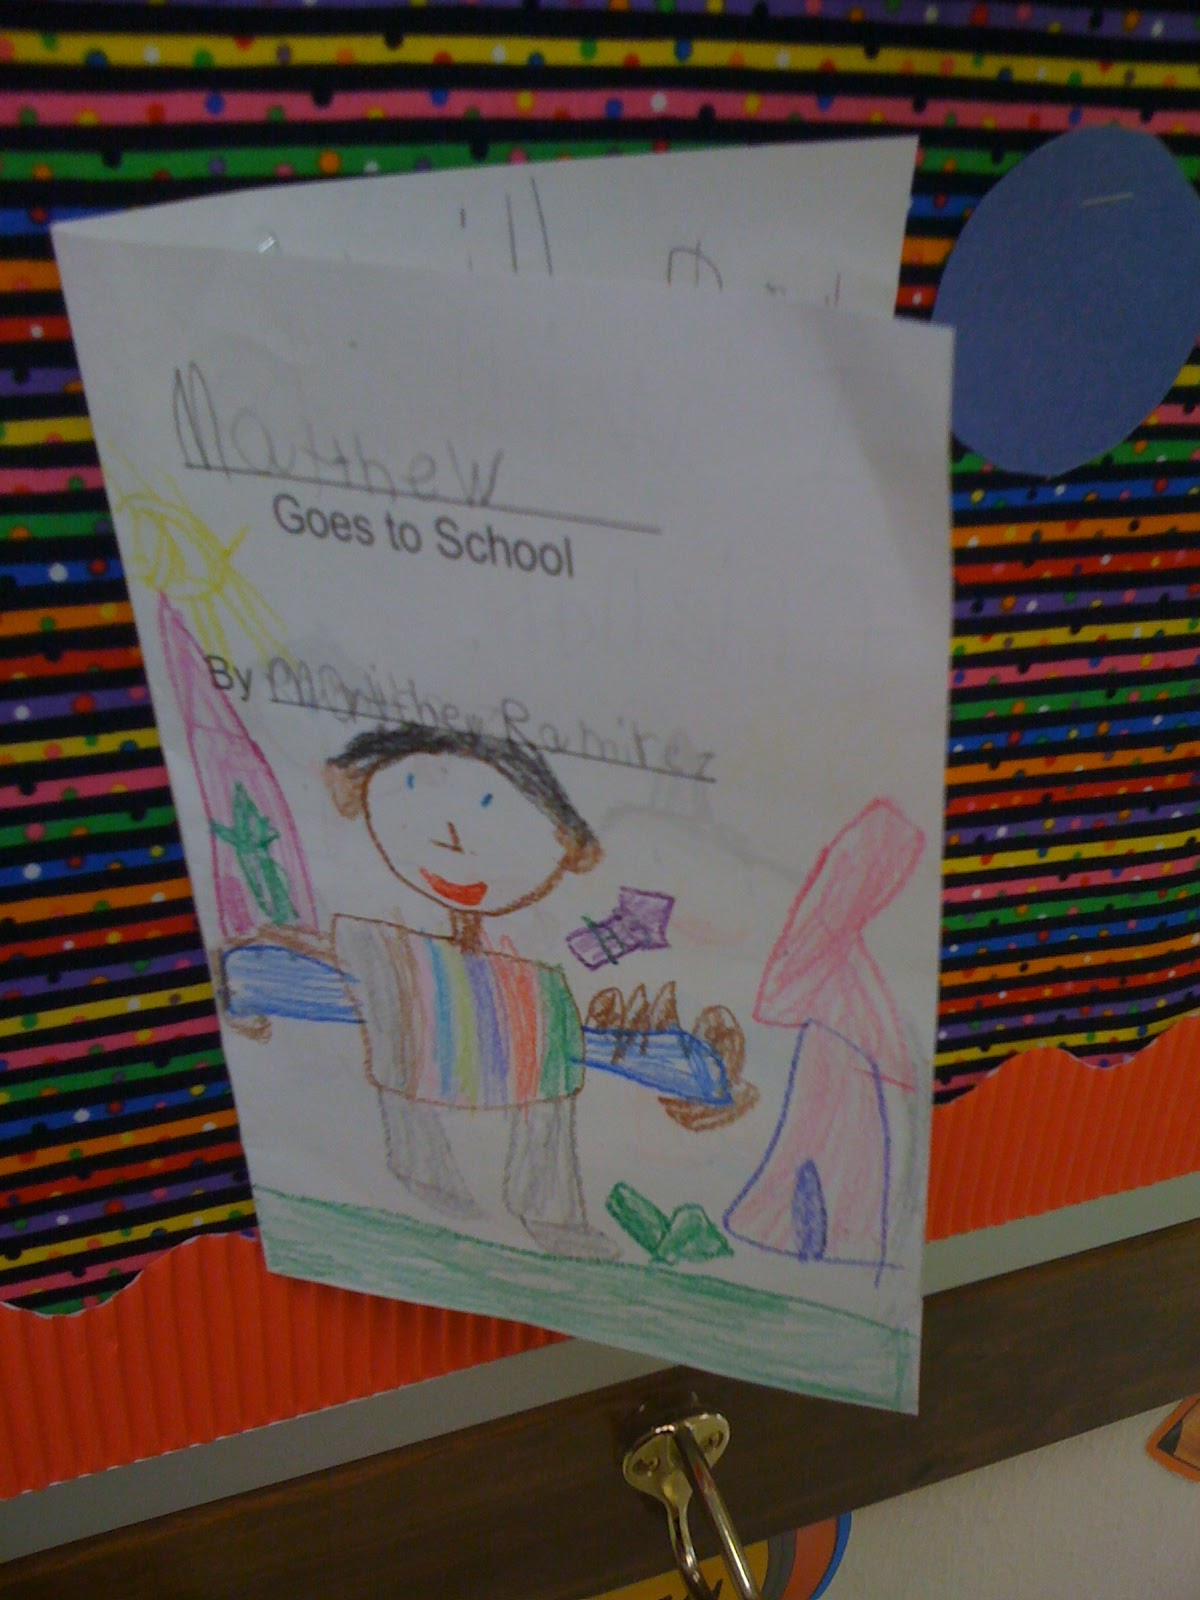 Bishop S Blackboard An Elementary Education Blog David Goes To School